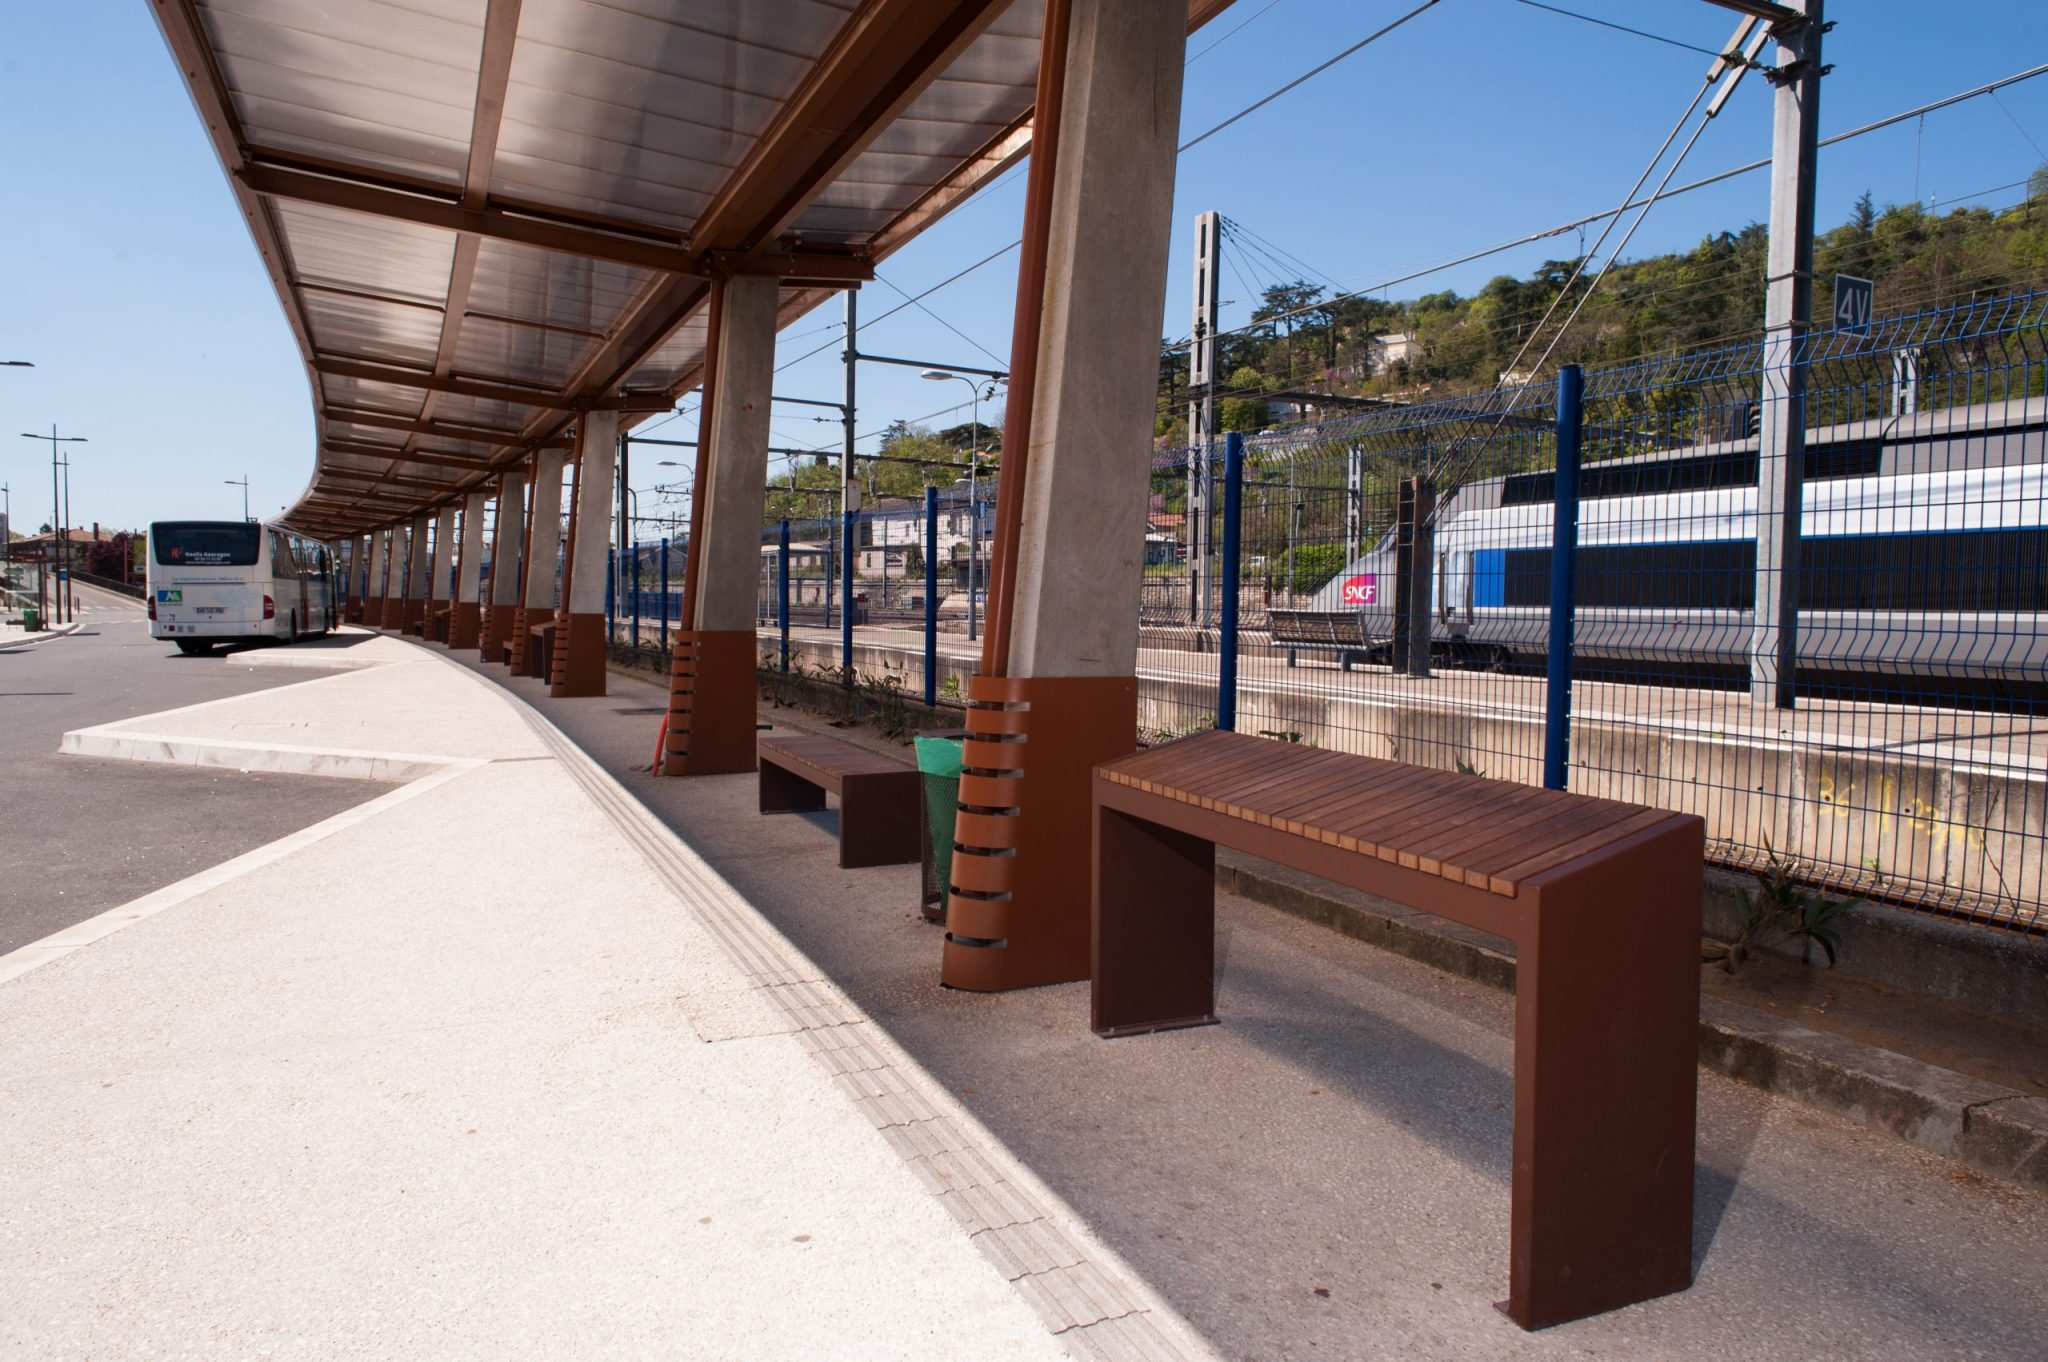 Agen - Gare pôle multimodal